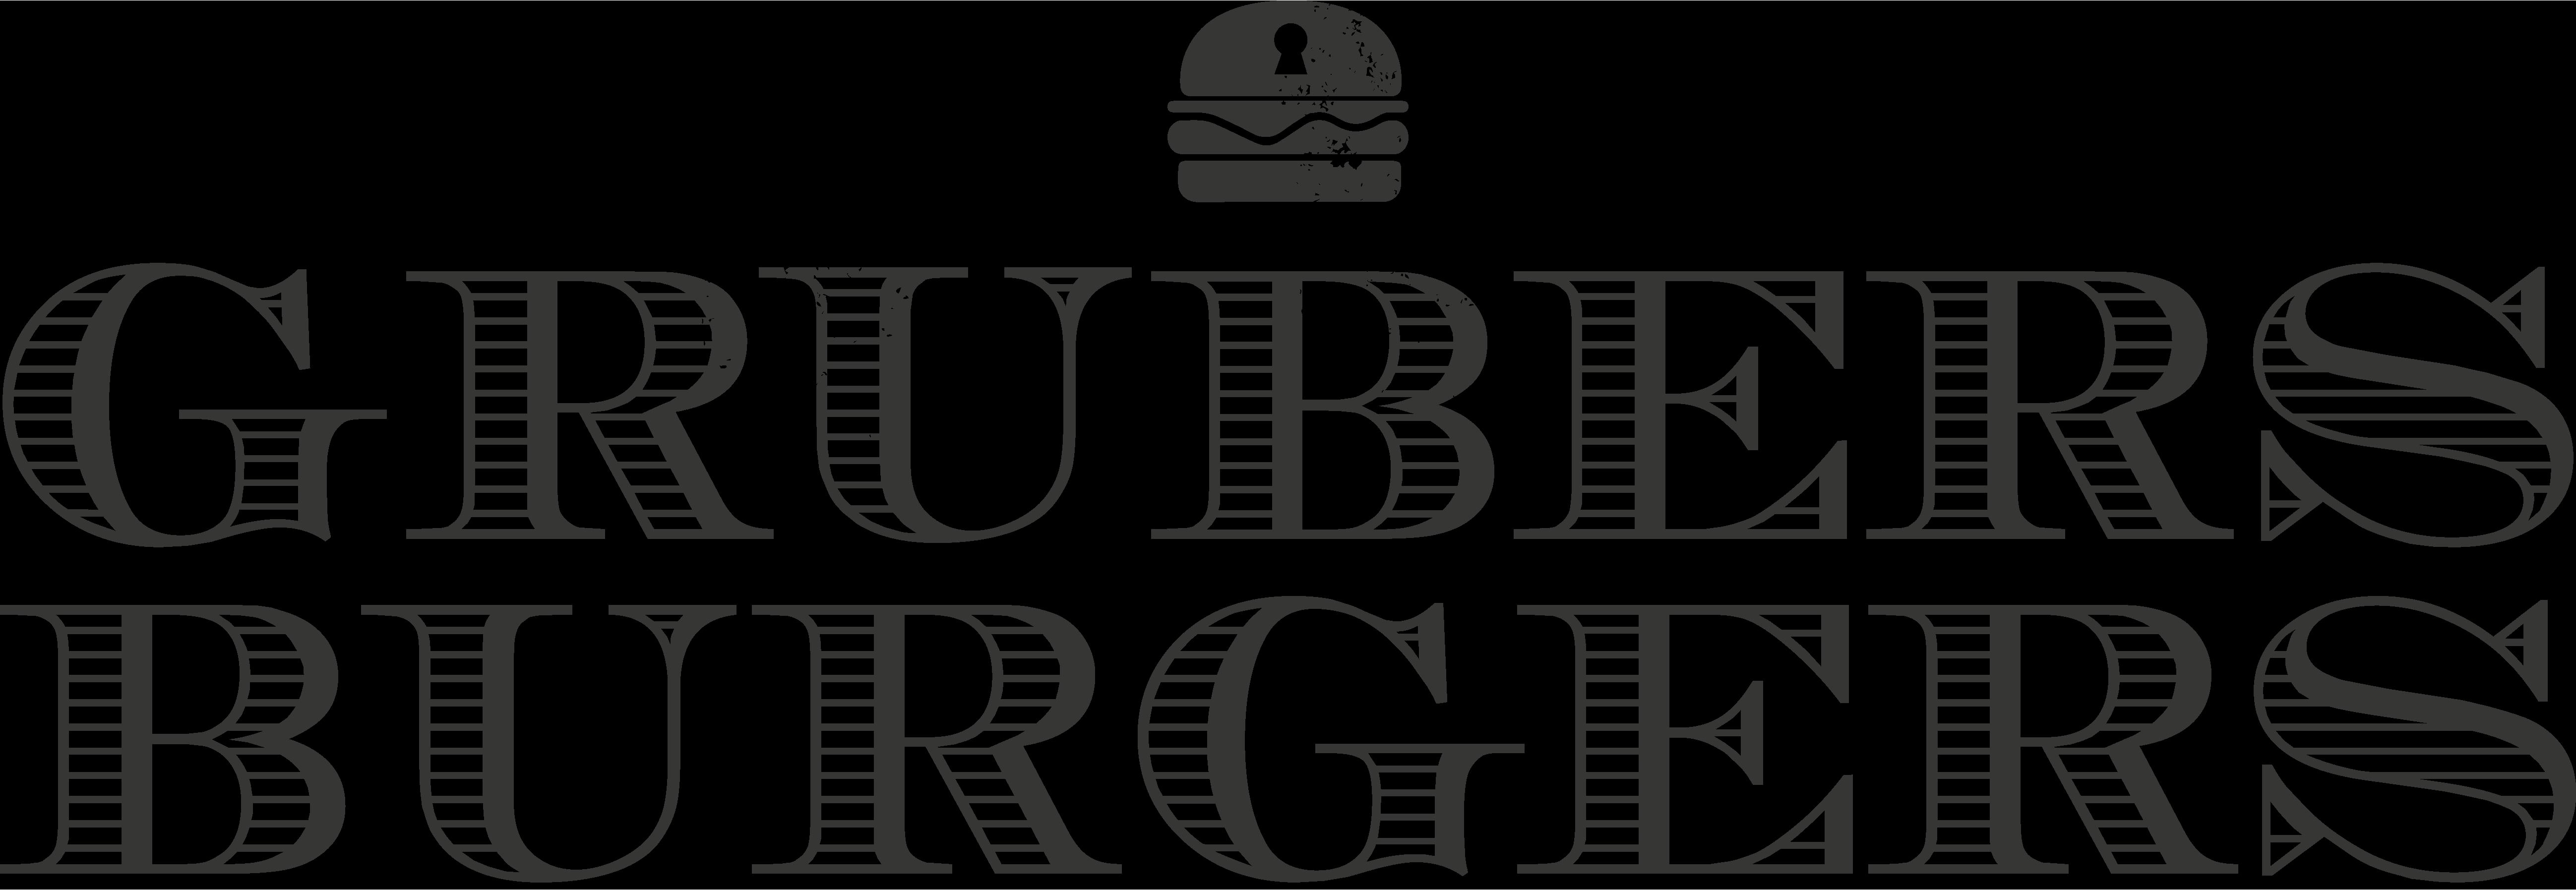 Grubers Burgers | Riccardo Giraudi | Restaurant | Logo